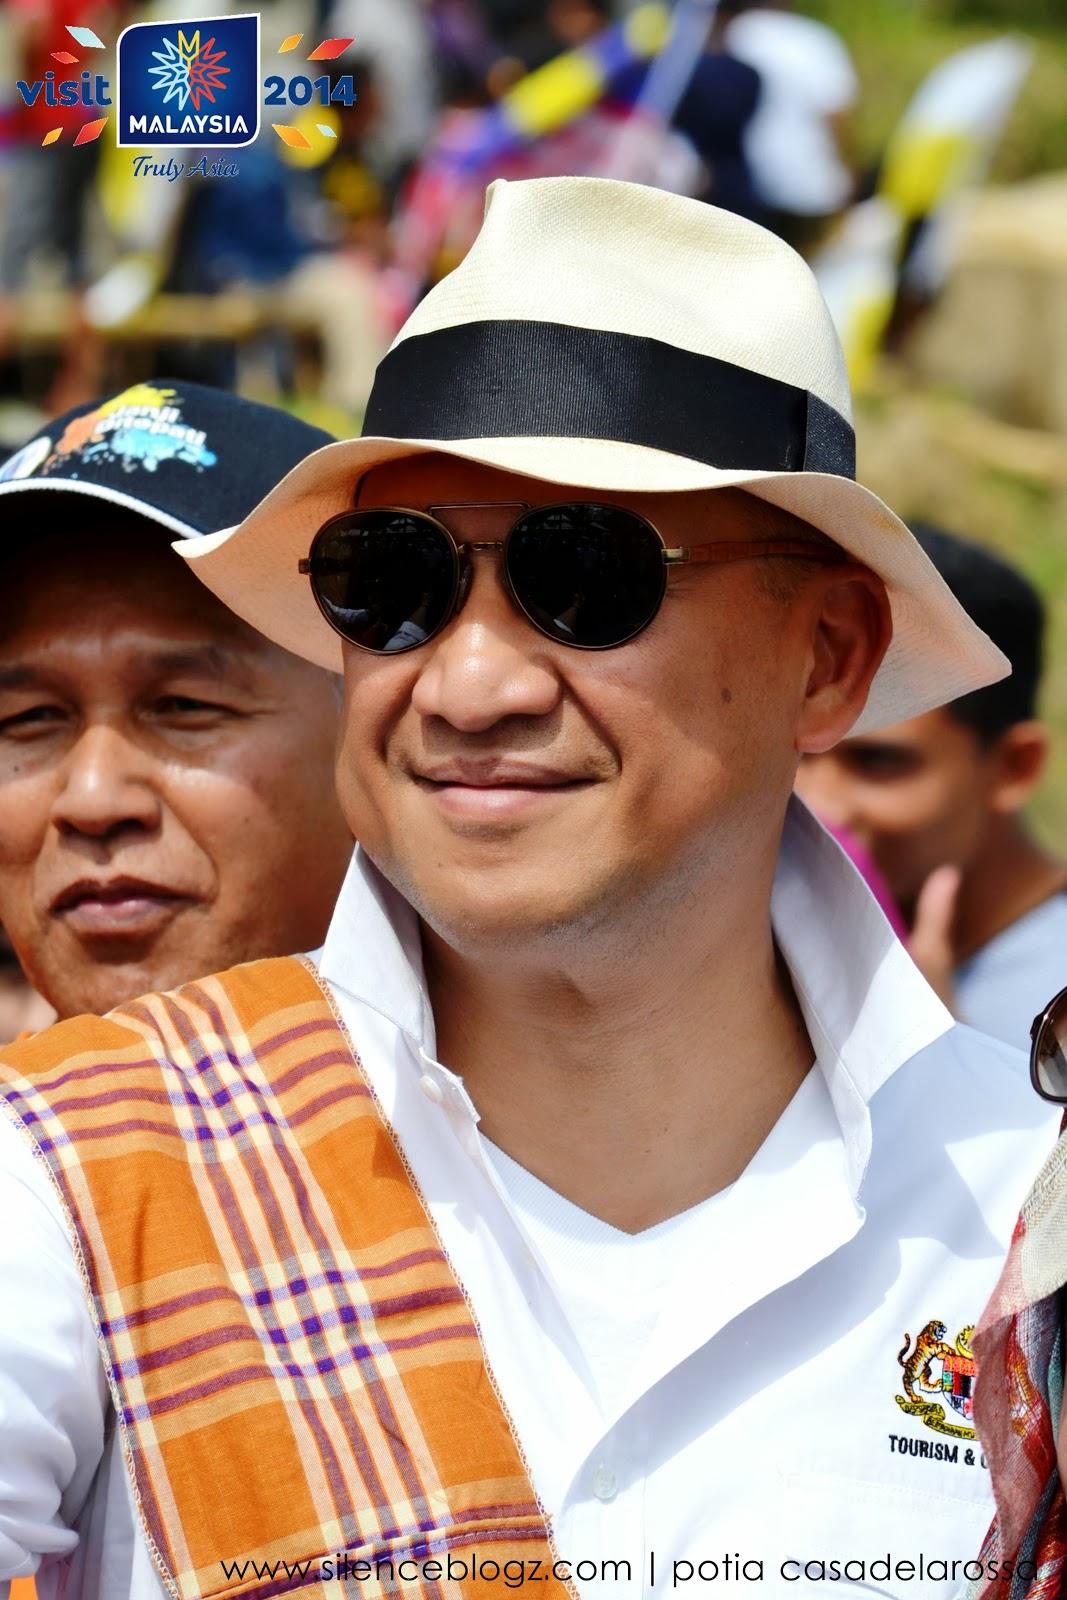 YB Dato' Seri Mohamed Nazri Abdul Aziz